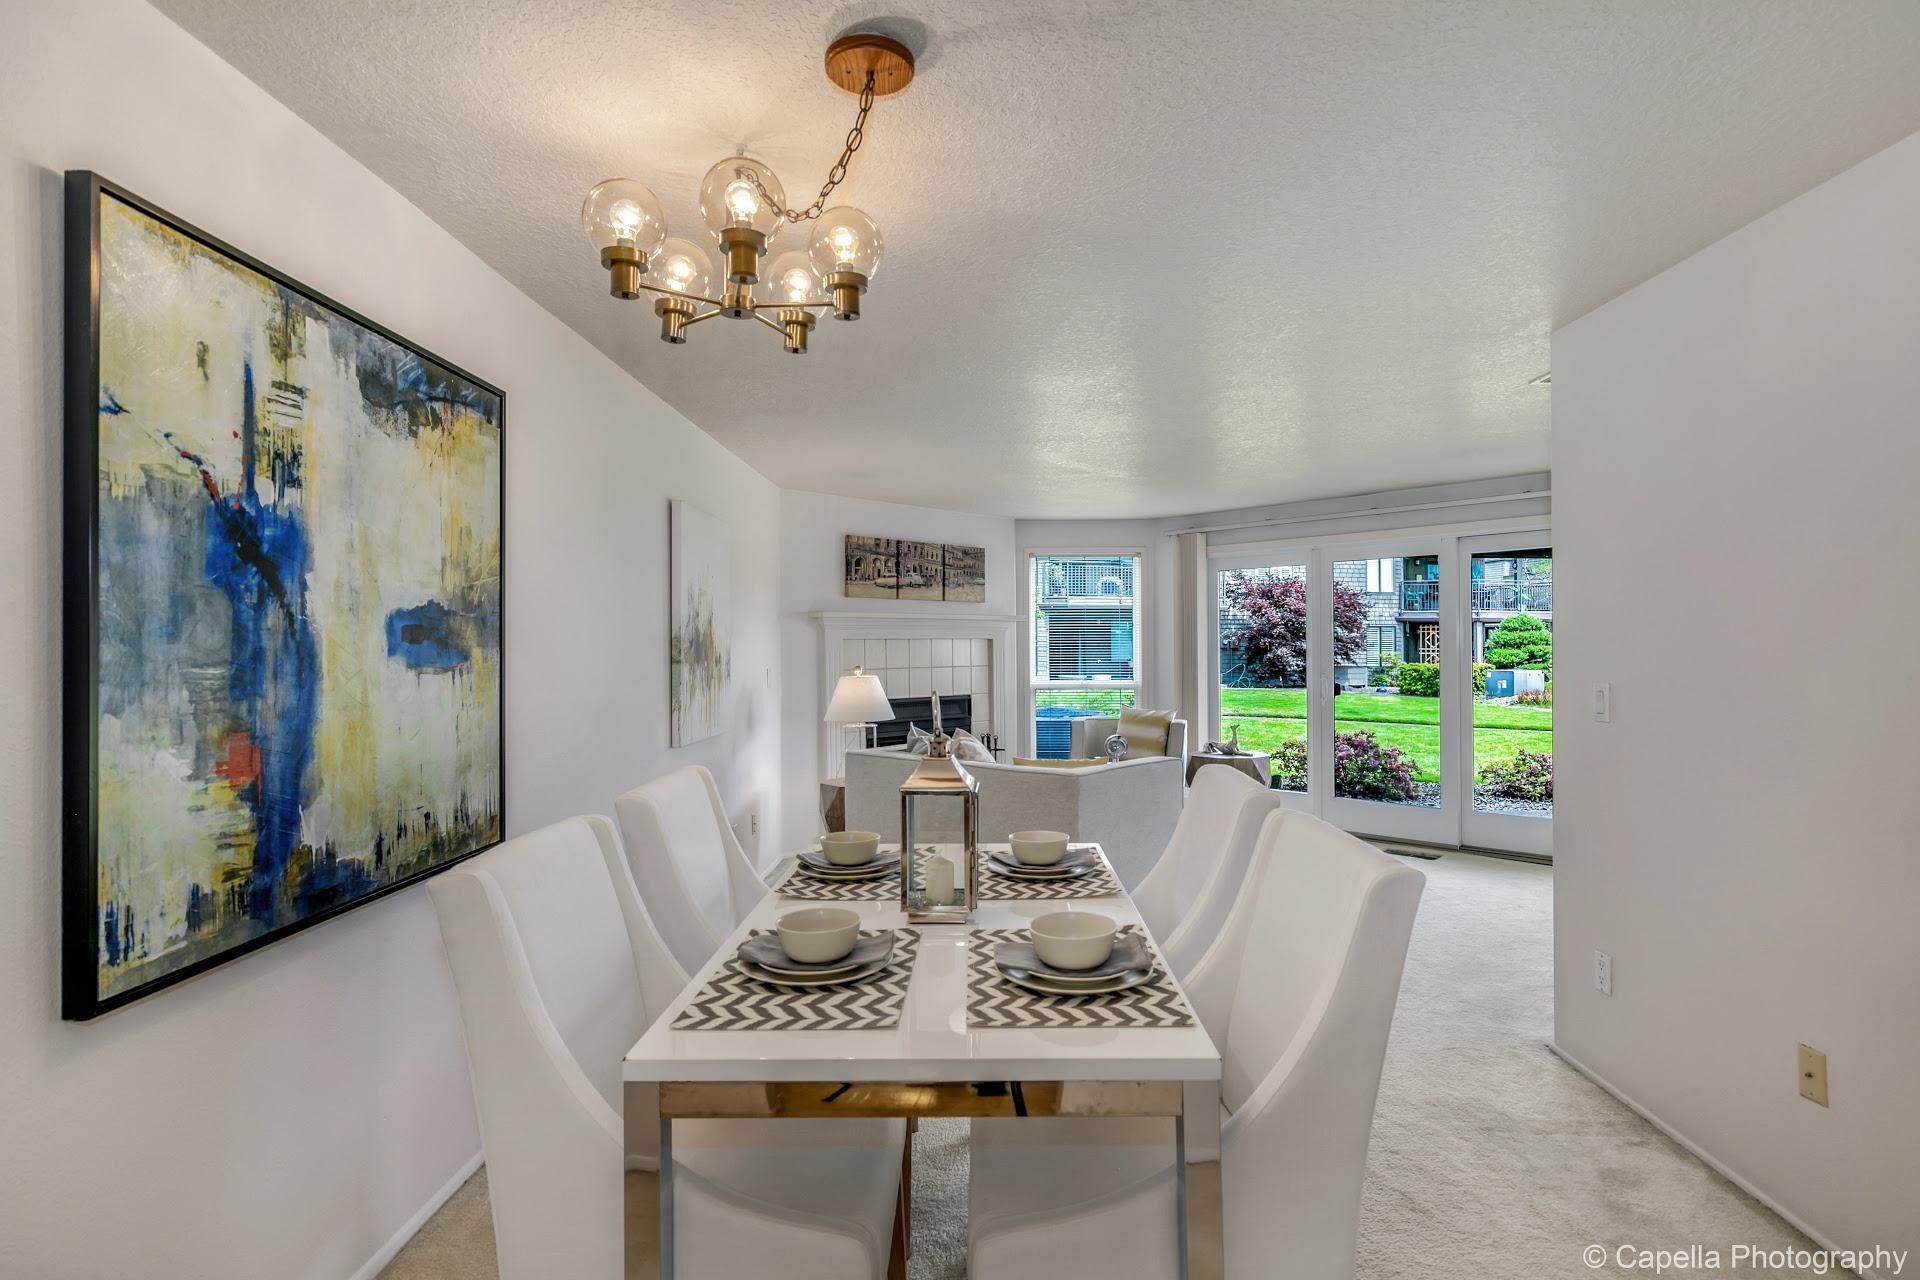 Willamette Shores Condo For Sale By Quick & Associates